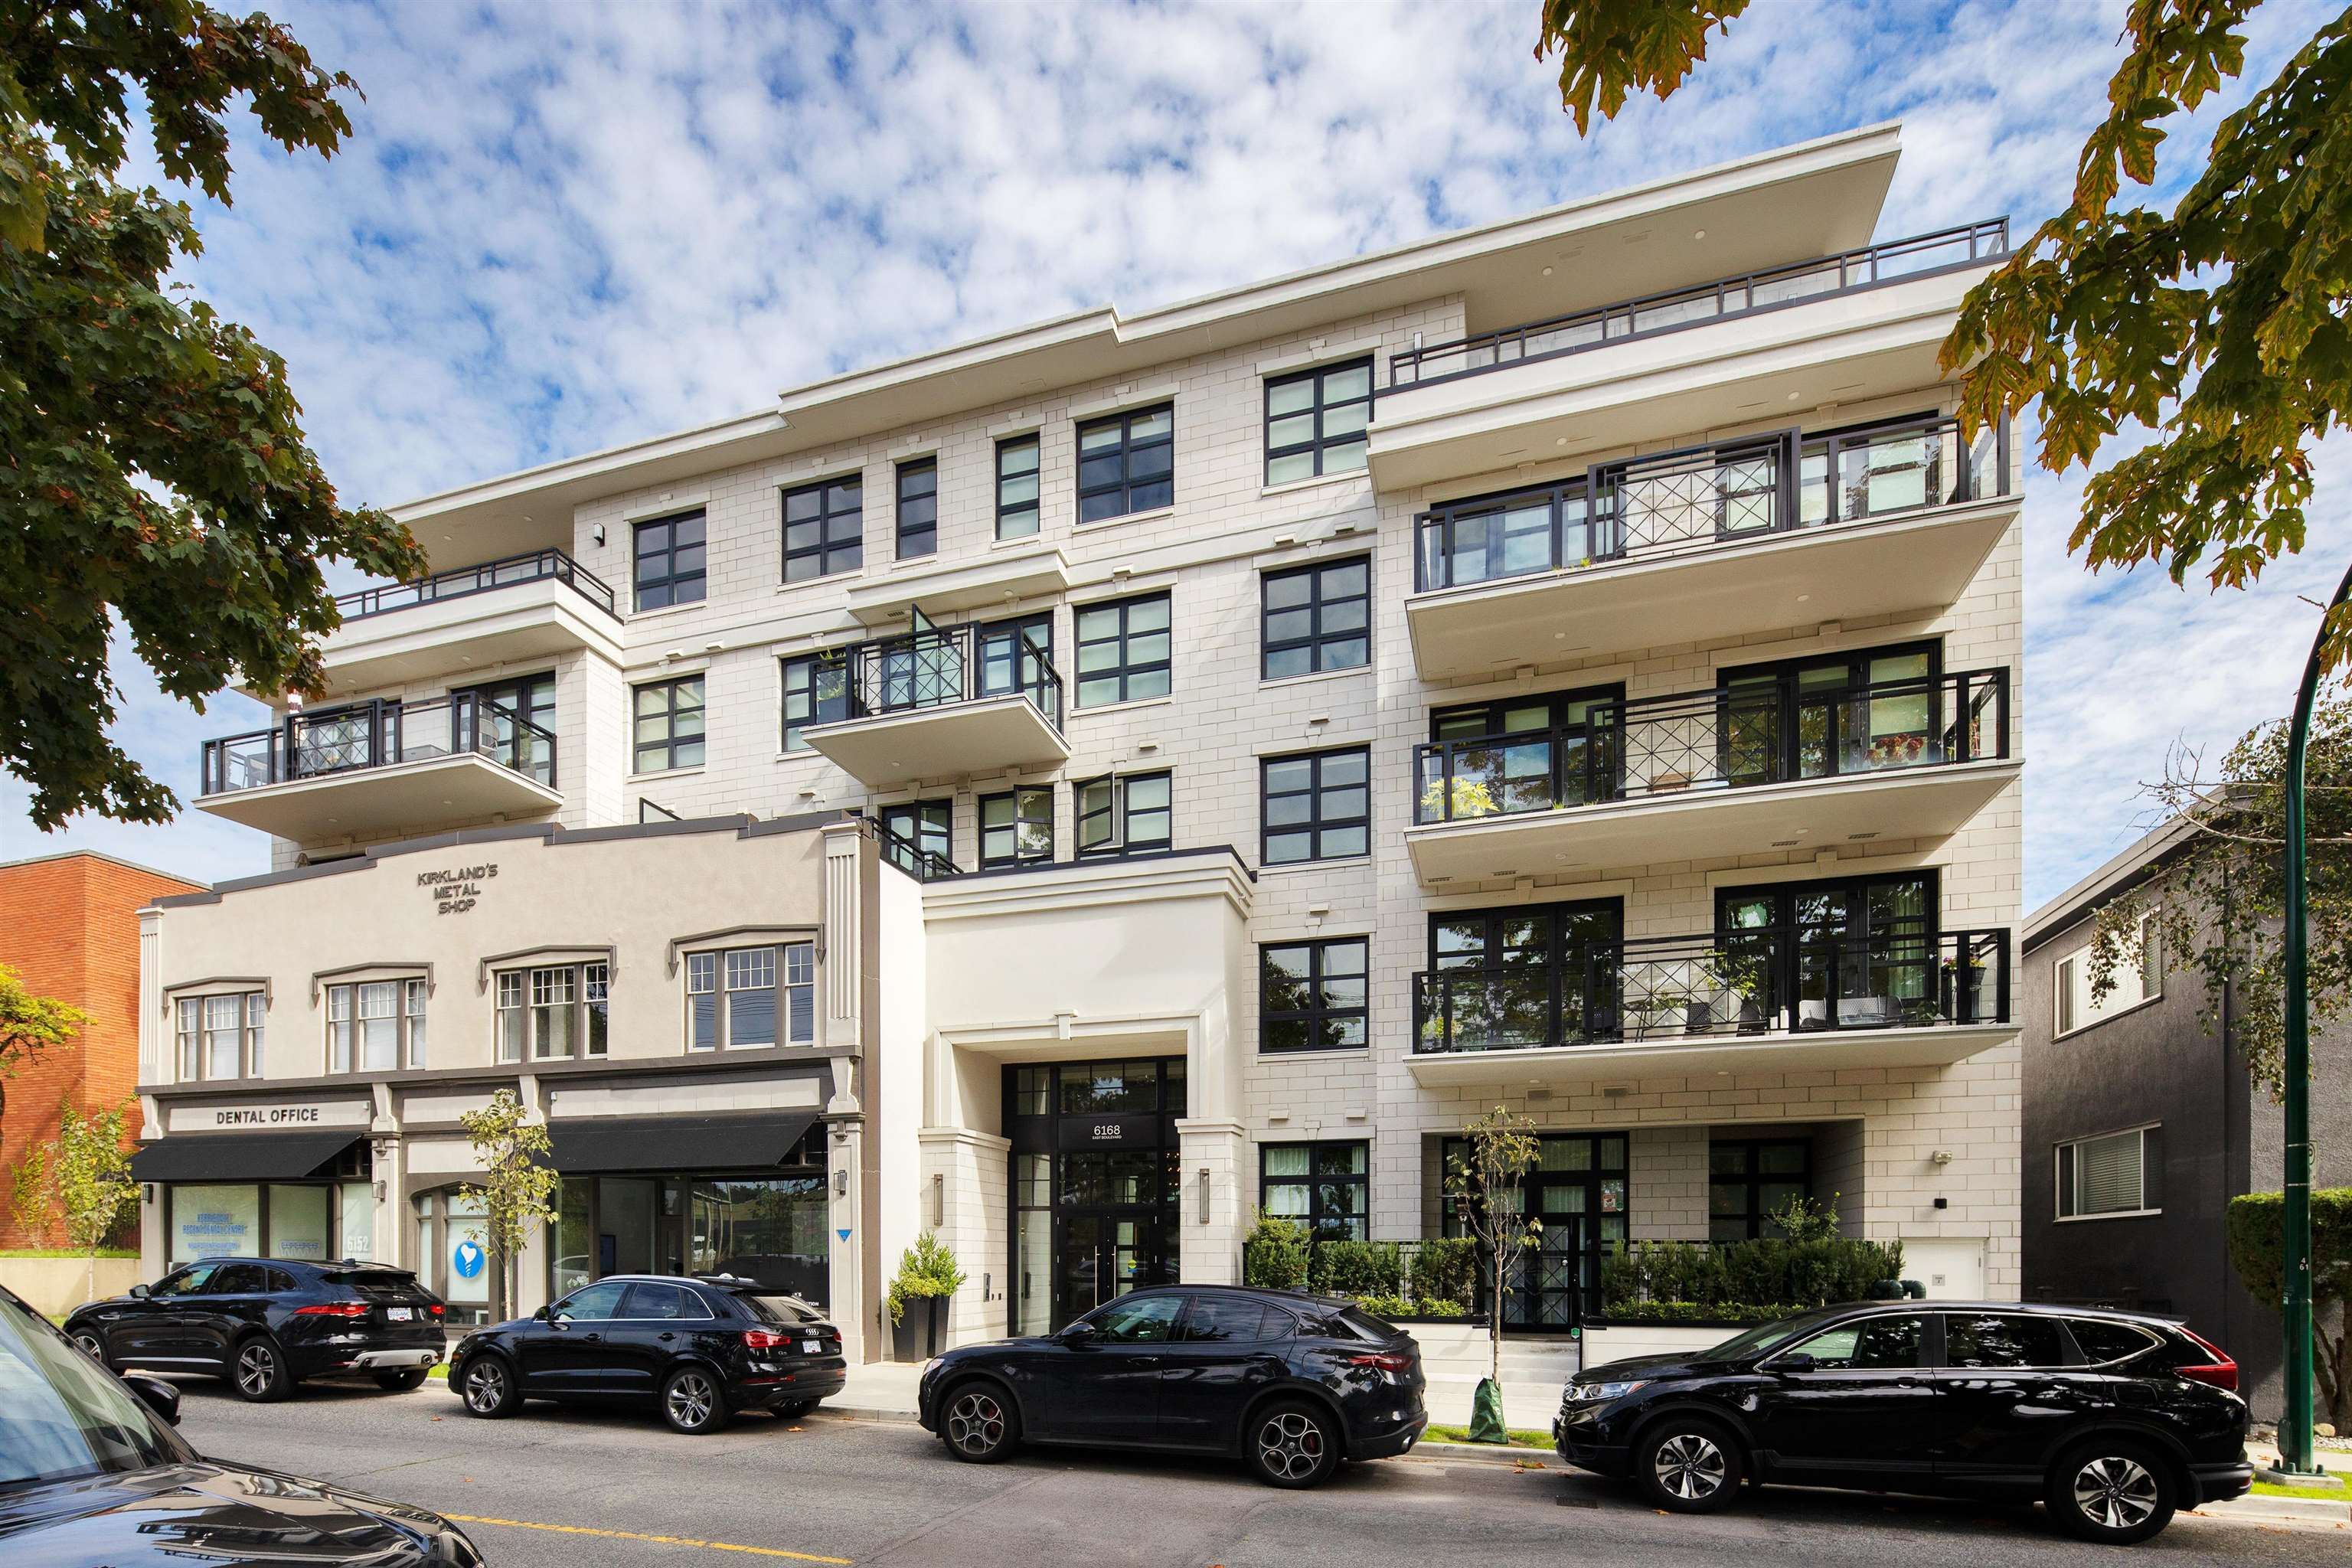 202 6168 EAST BOULEVARD - Kerrisdale Apartment/Condo for sale, 2 Bedrooms (R2621058)